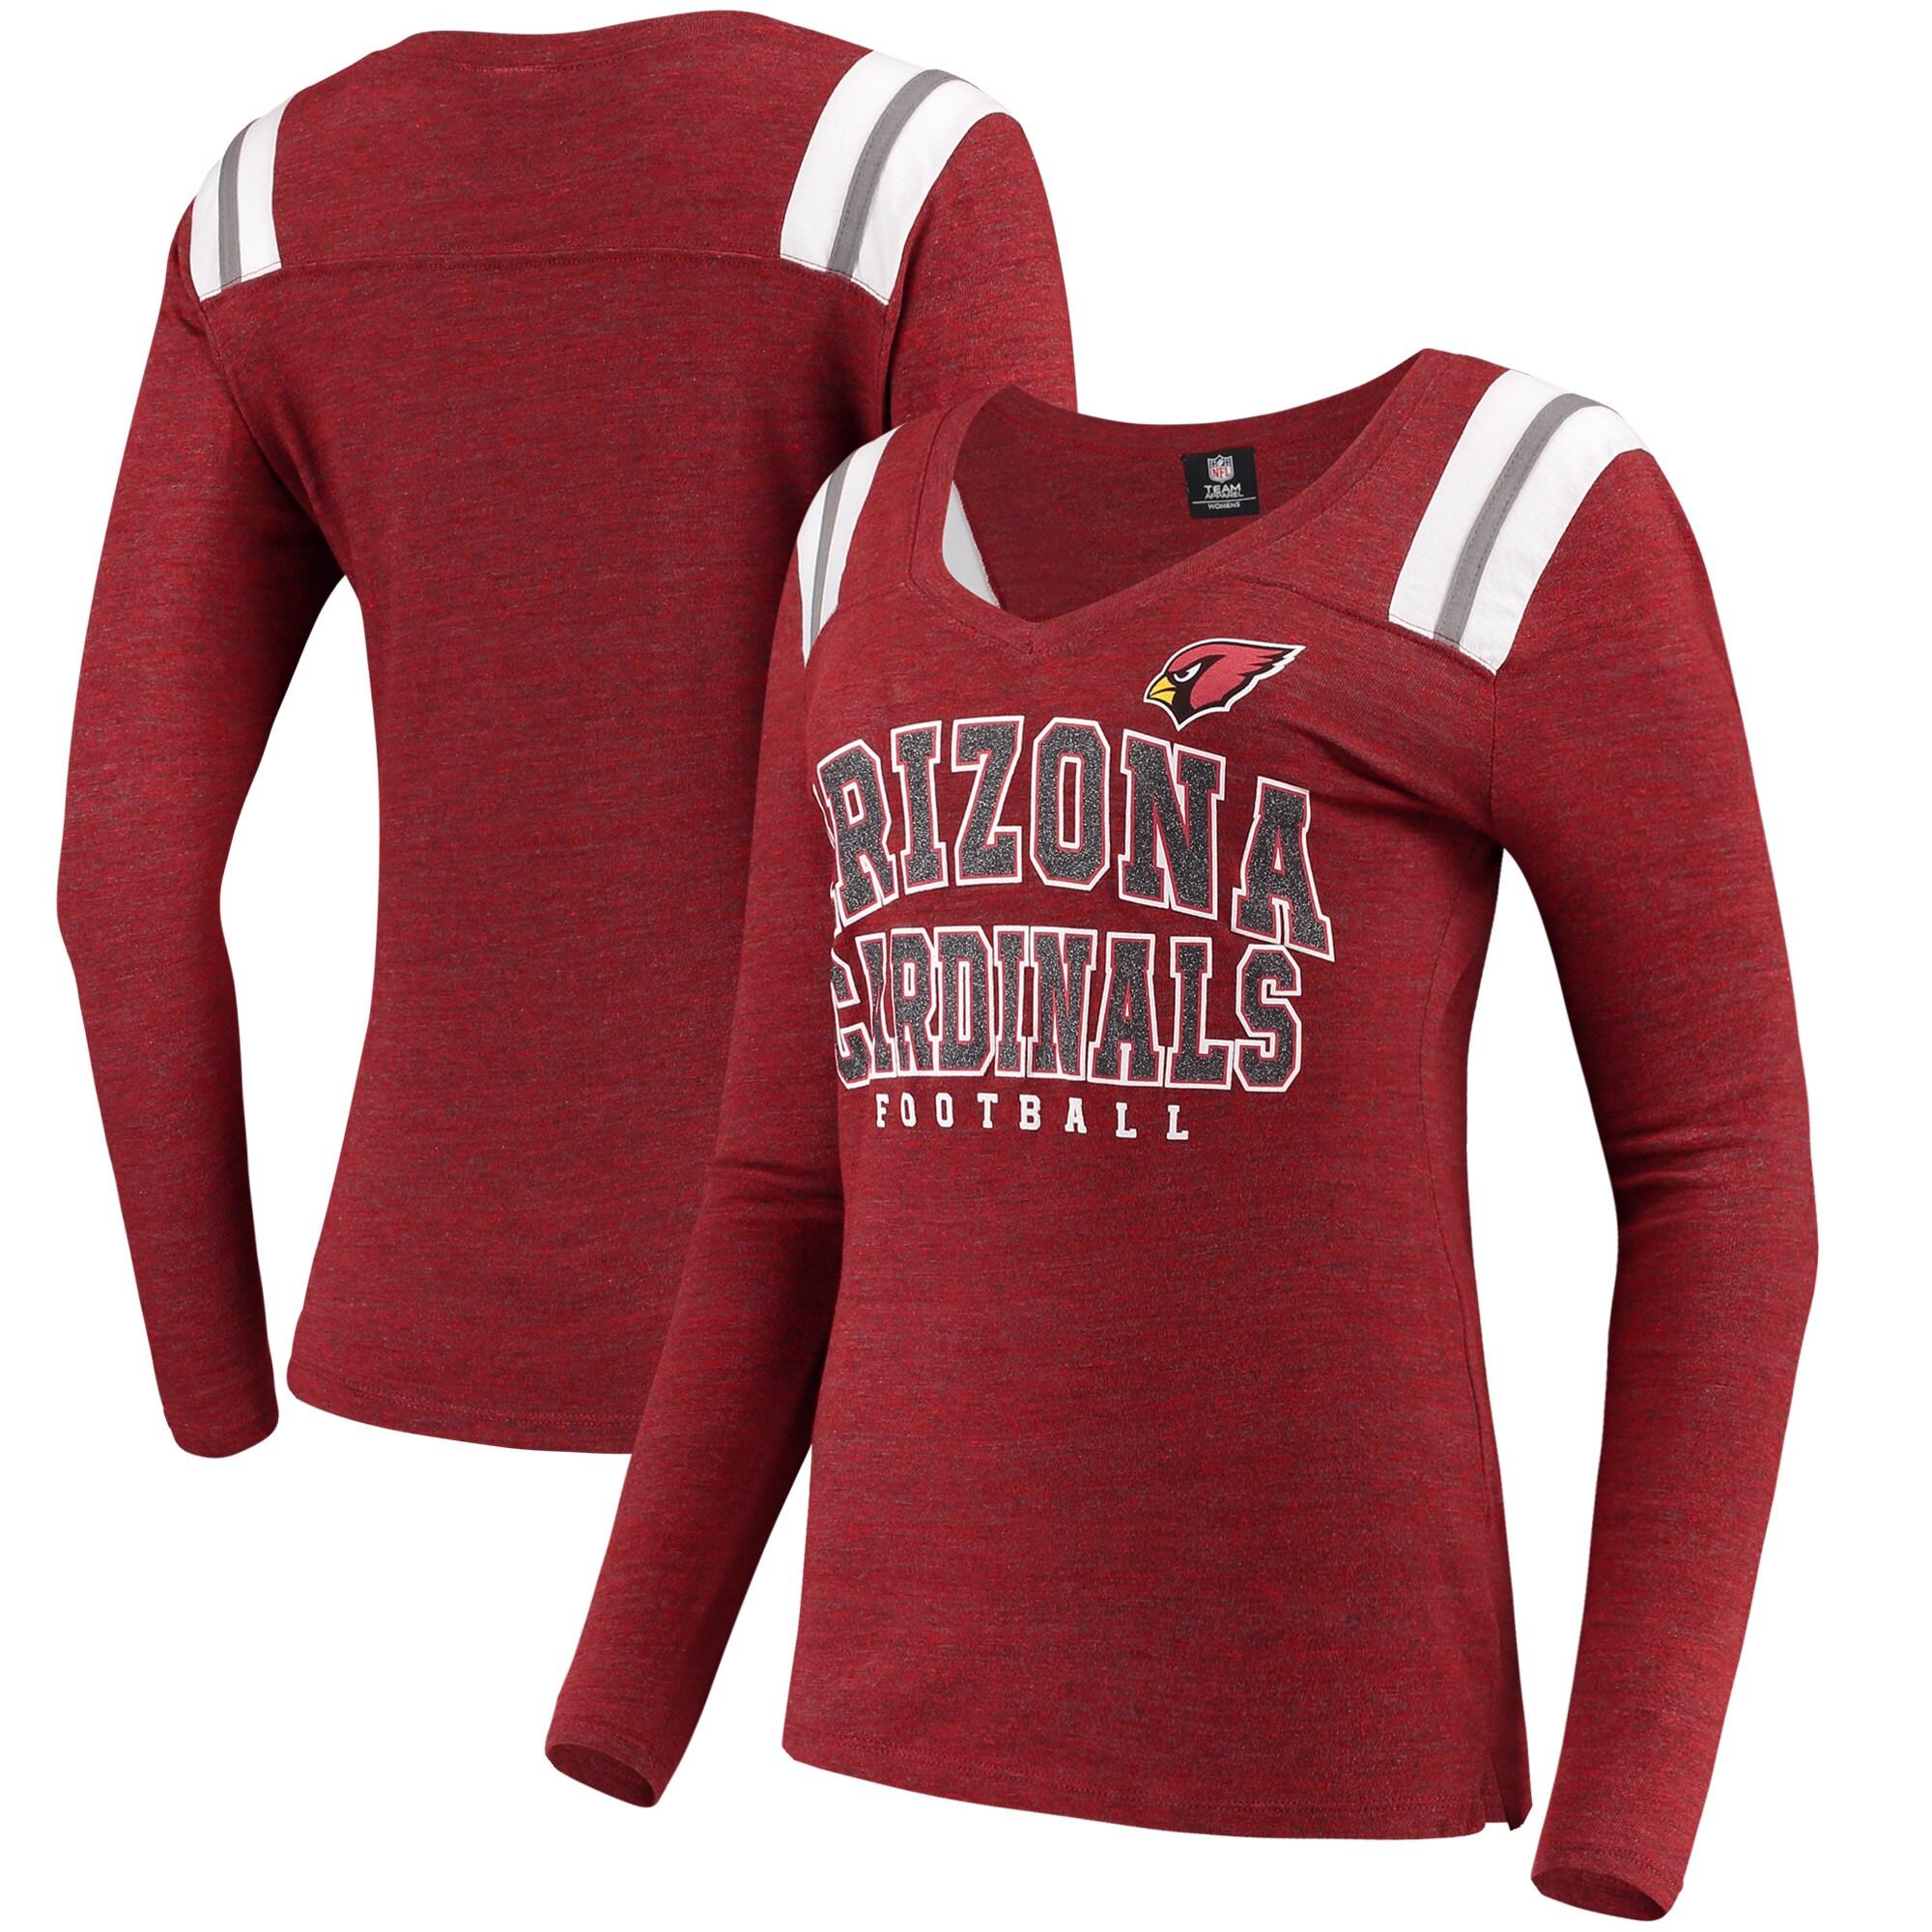 Arizona Cardinals 5th & Ocean by New Era Women's Tri-Blend Long Sleeve V-Neck T-Shirt - Cardinal